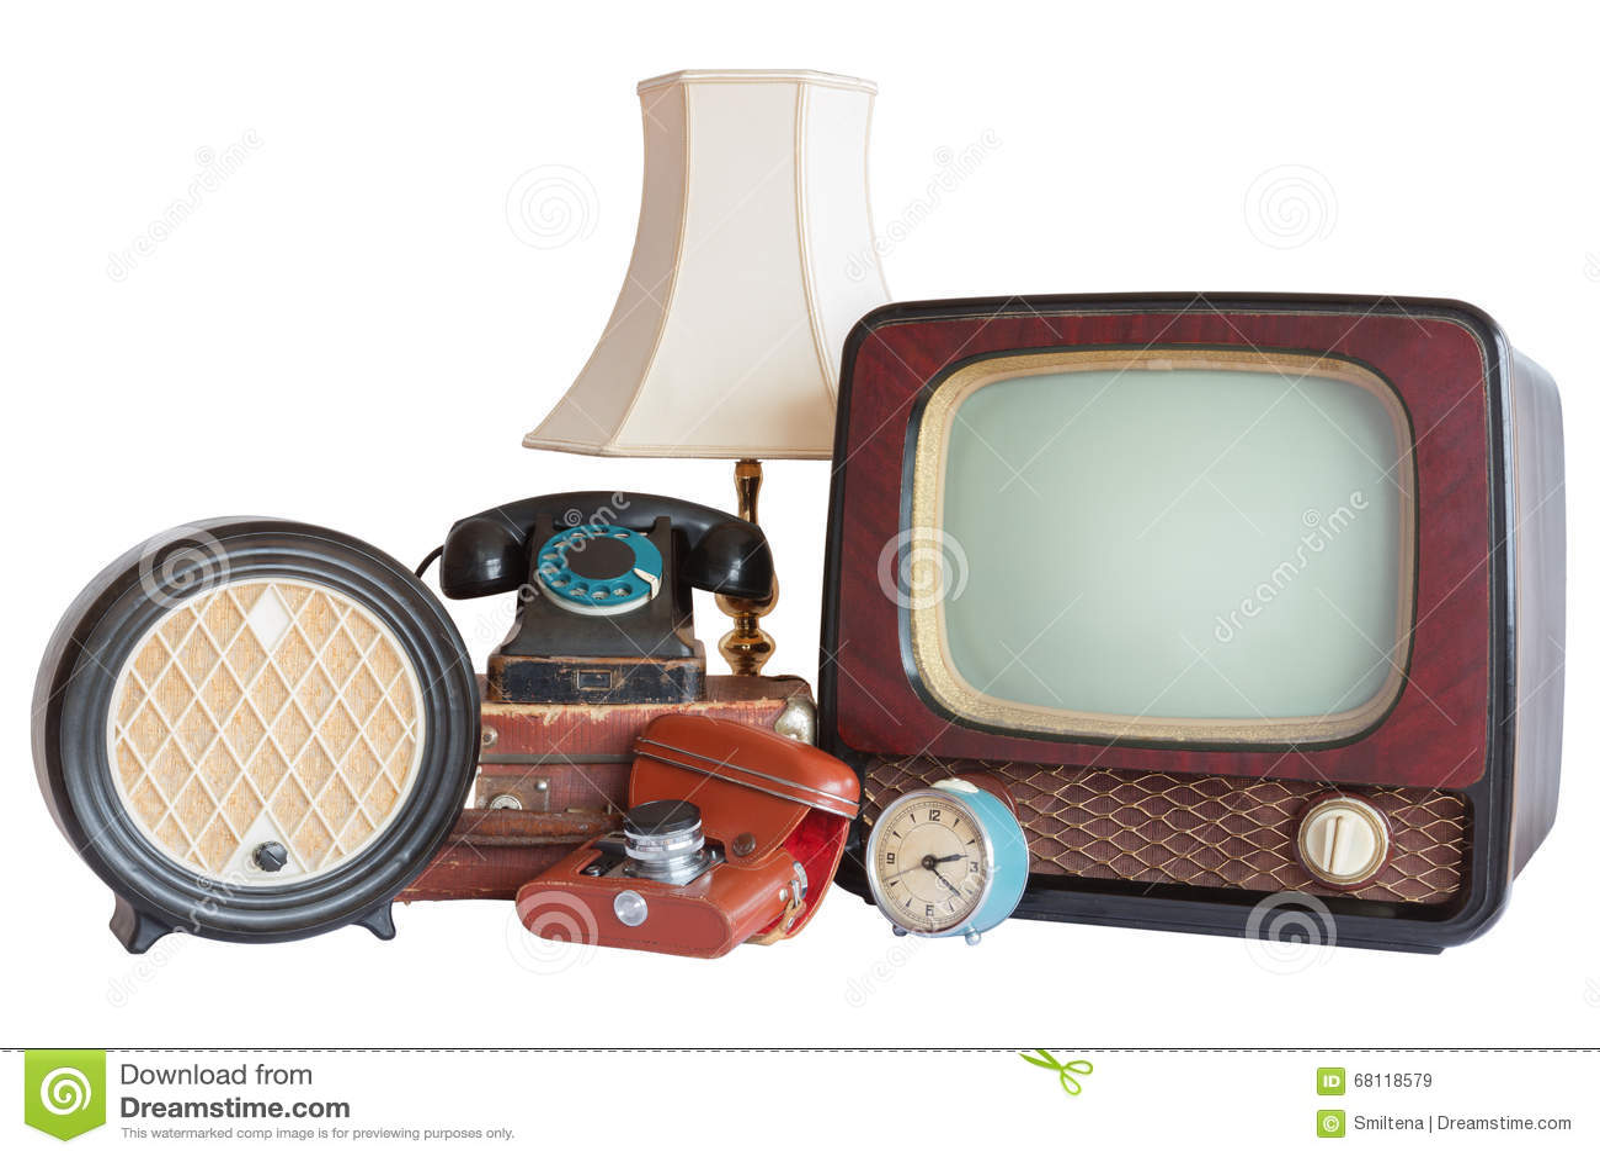 Old household items: TV, radio, camera, alarm, phone, table lamp